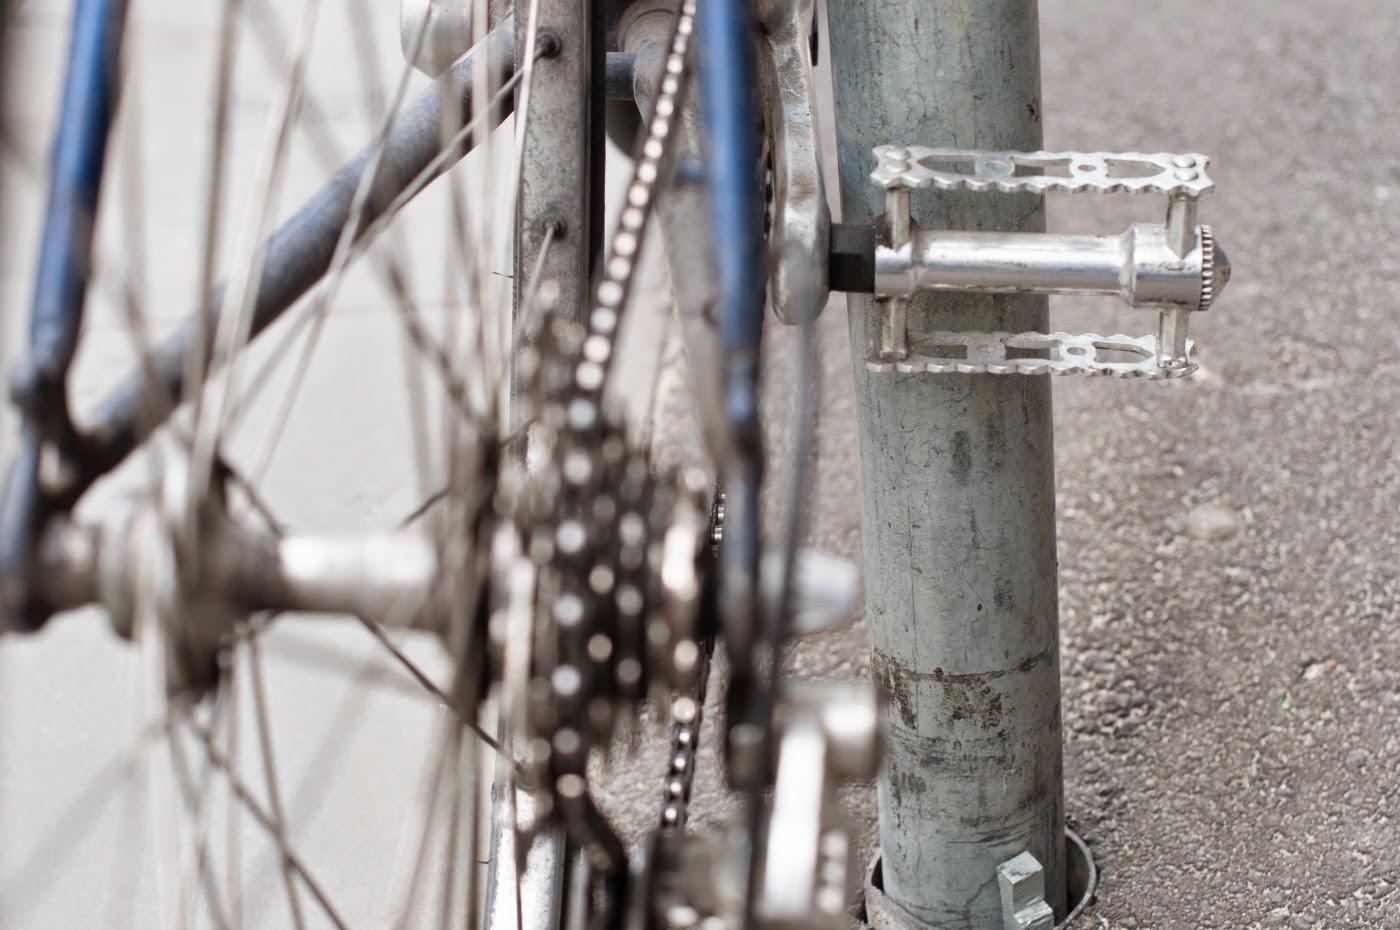 Nishiki, custom sport, 14 speed road bike, Swanston St, Melbourne, Australia, Tim Macauley, the Biketorialist, bespoke, frame, shimano 600